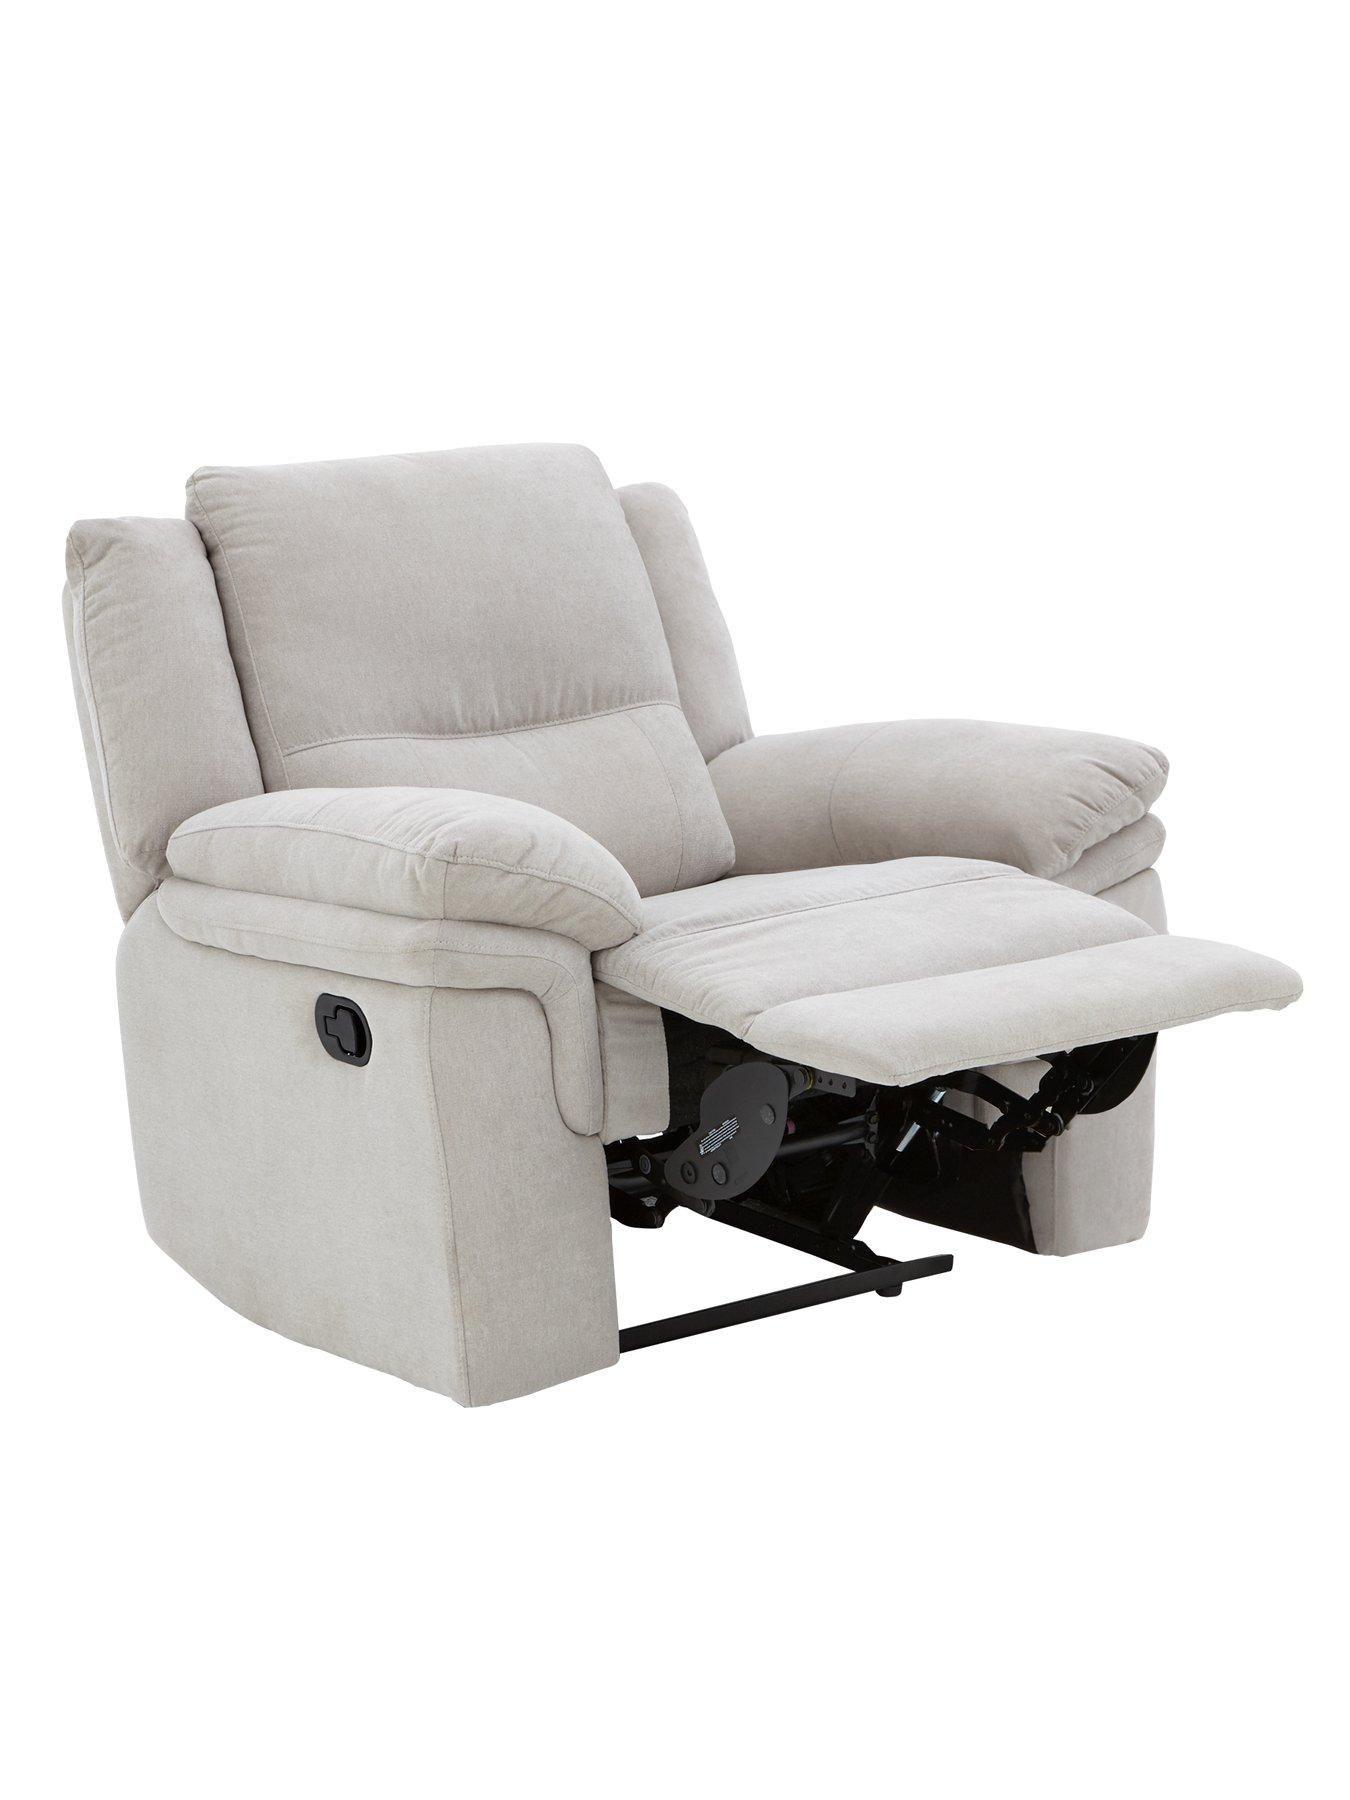 Fabric Manual Recliner Chairs Uk Sante Blog